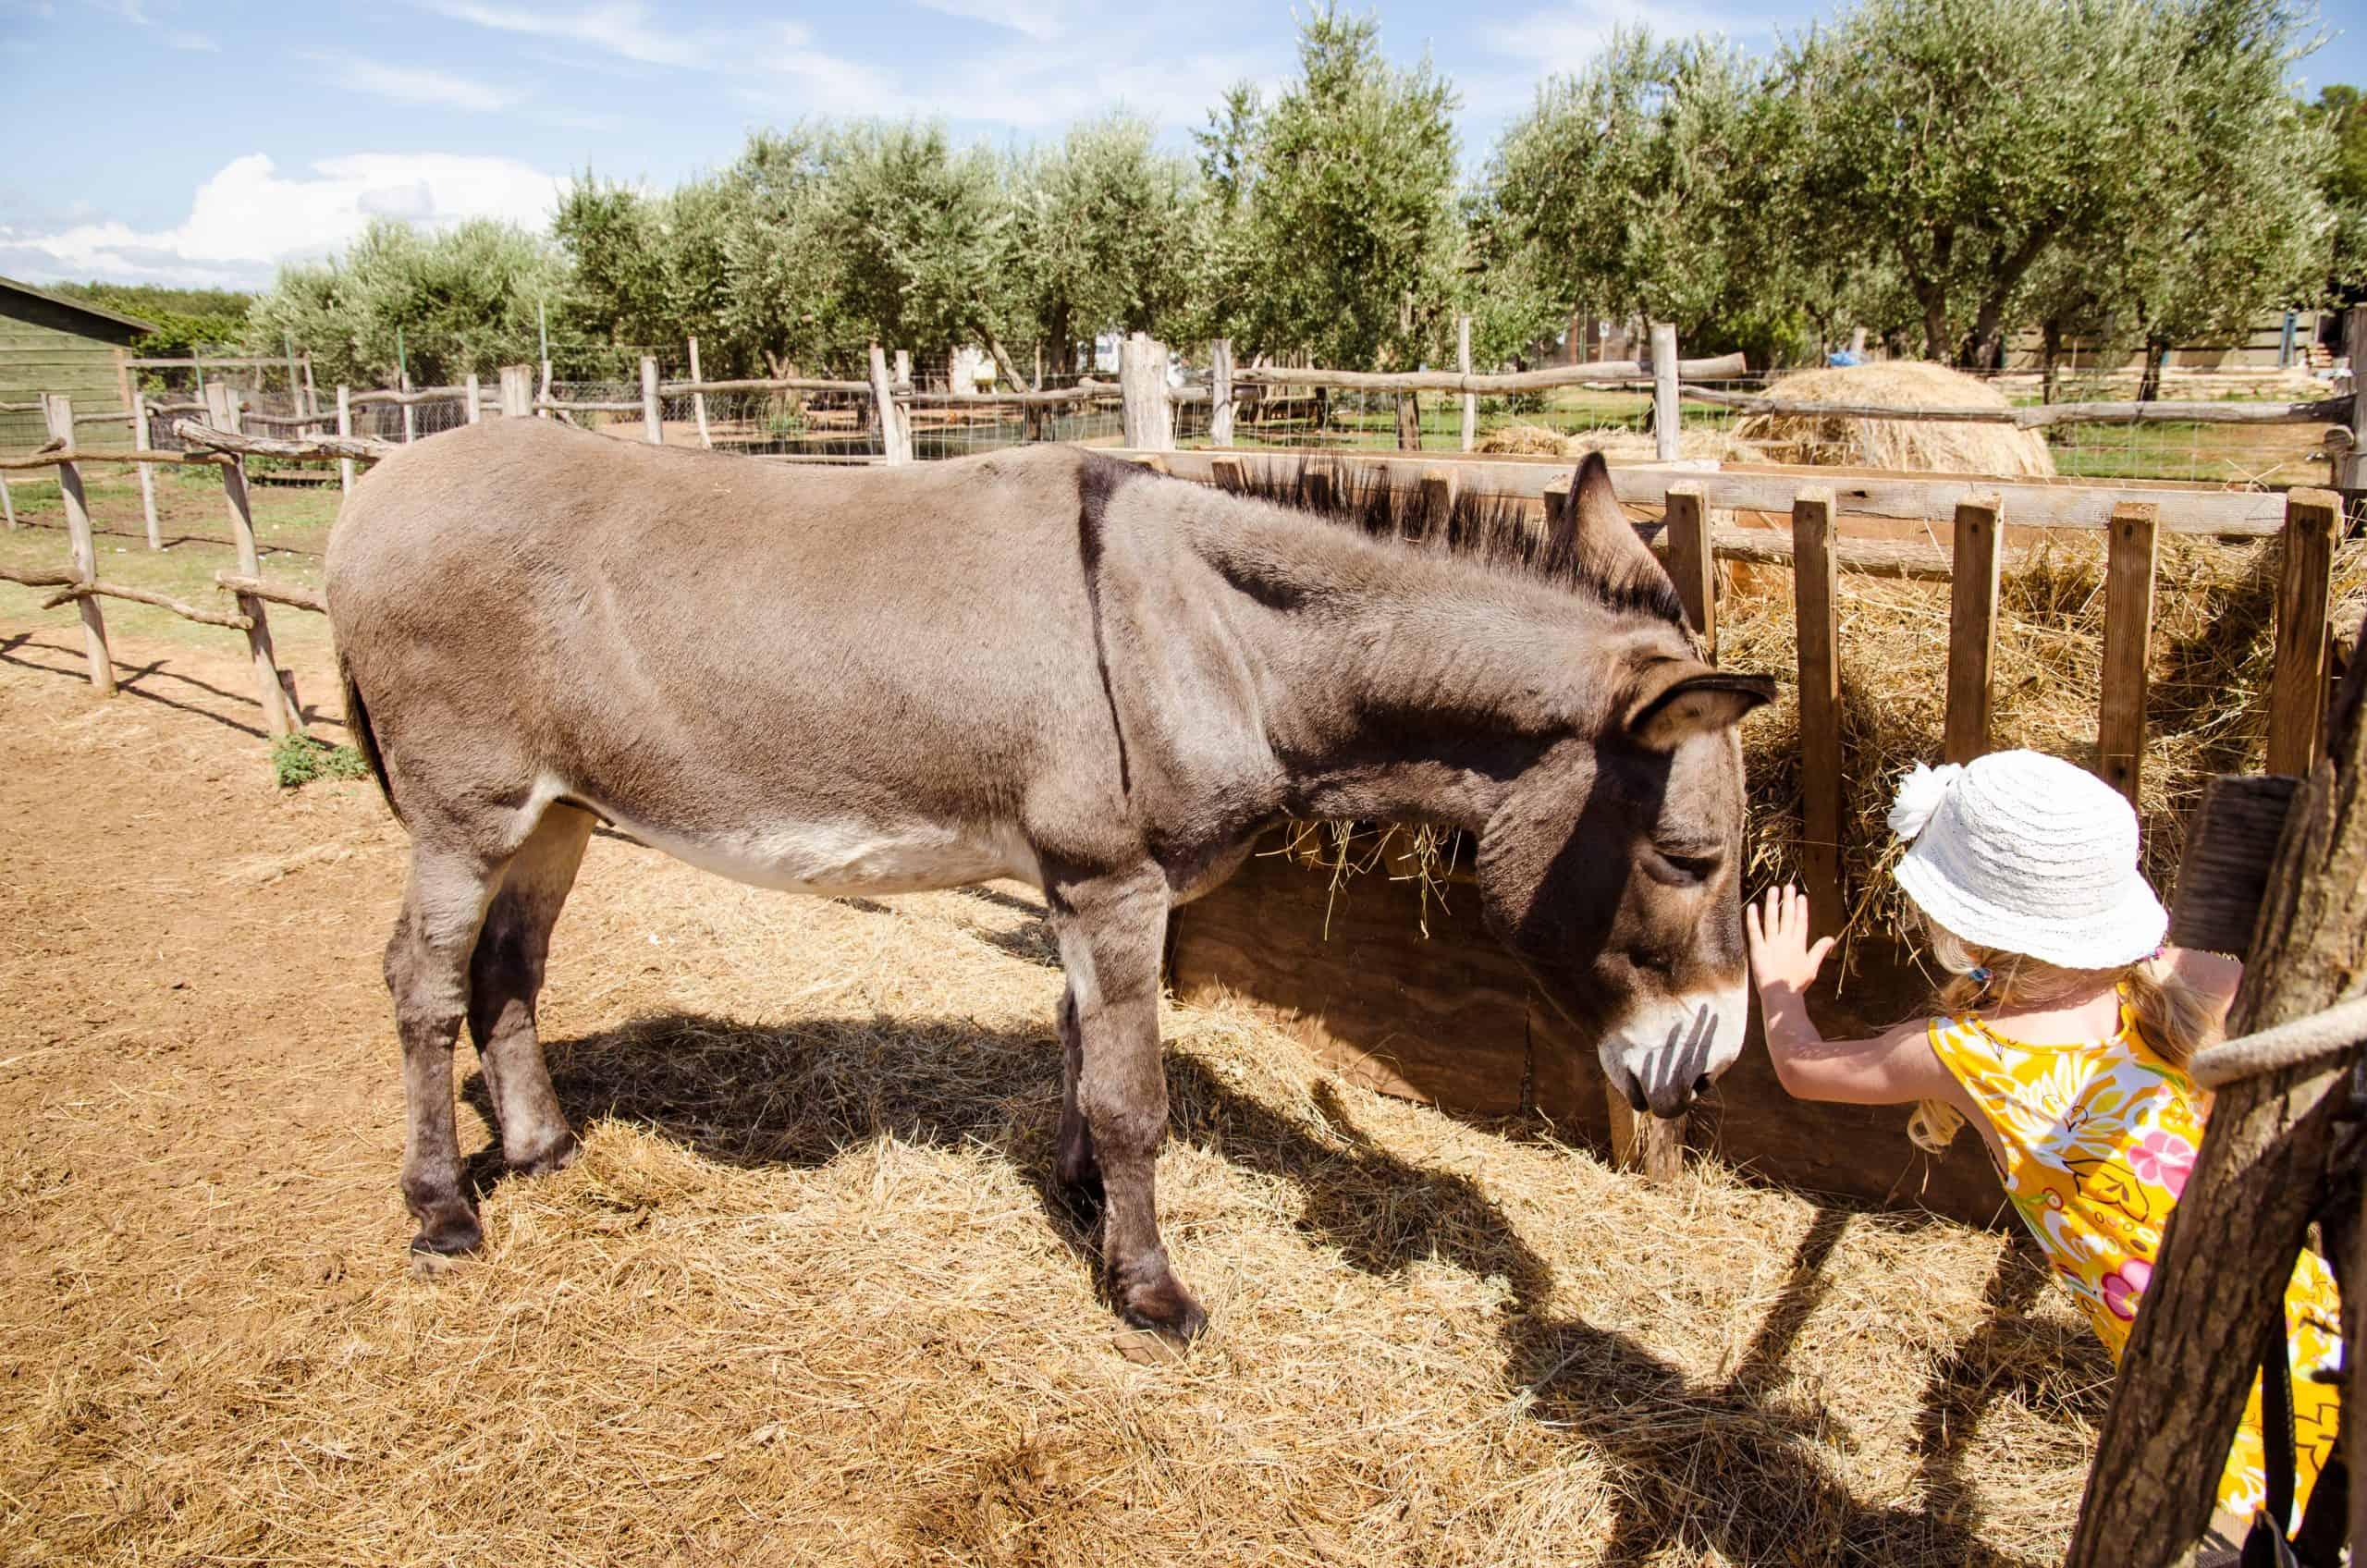 little kid feeding a horse in the farm